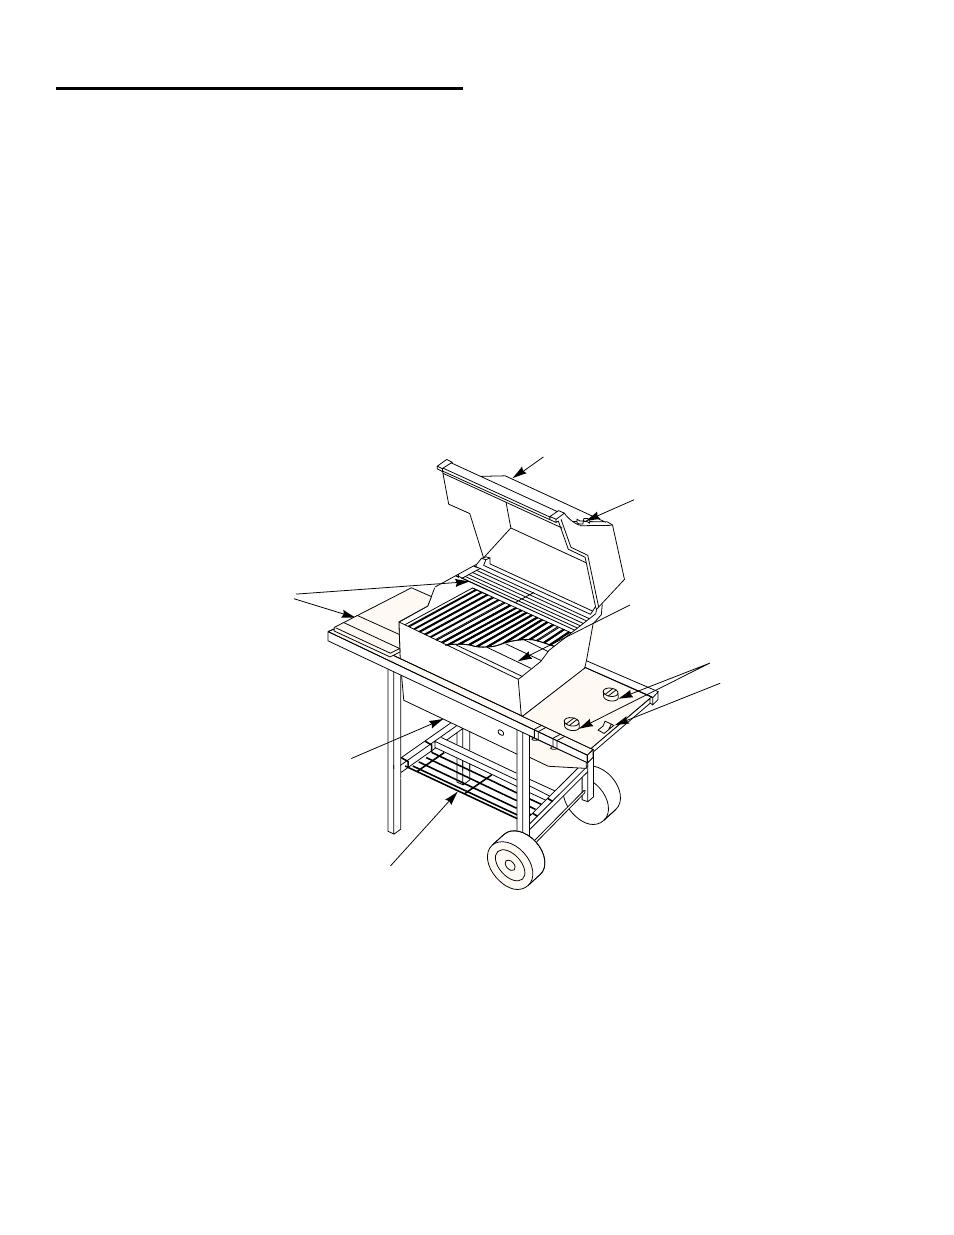 weber SPIRIT 500 LX User Manual | Page 5 / 32